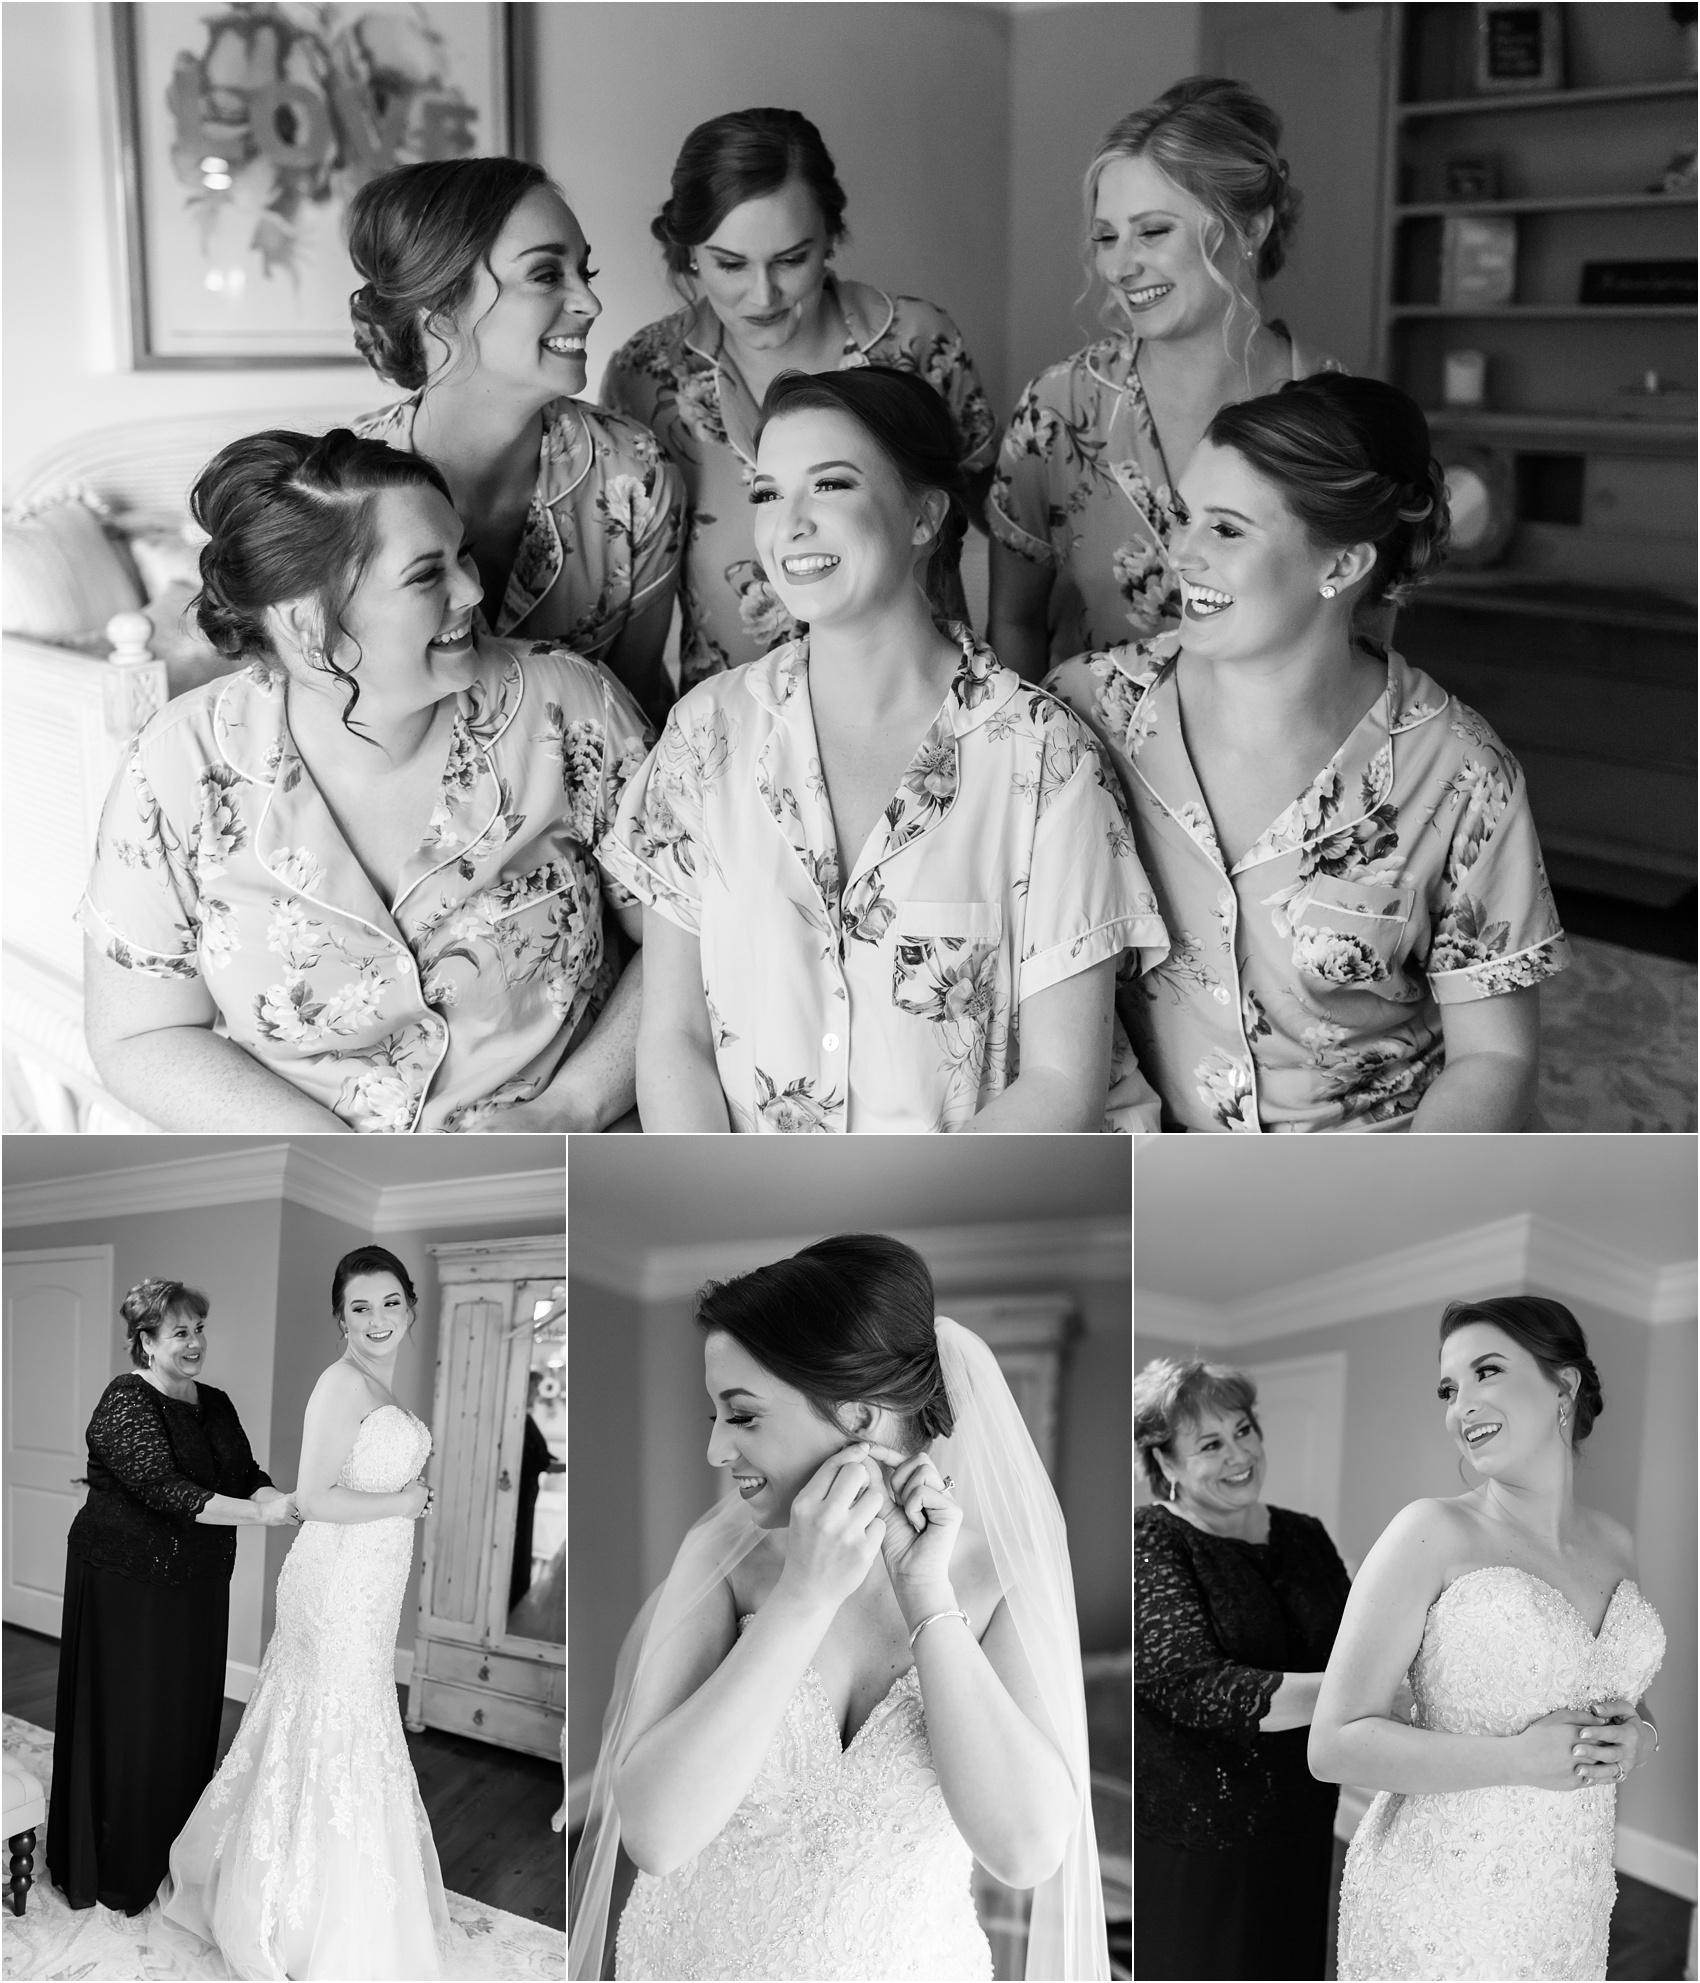 Savannah Eve Photography- Nutt Wedding- Blog-6.jpg